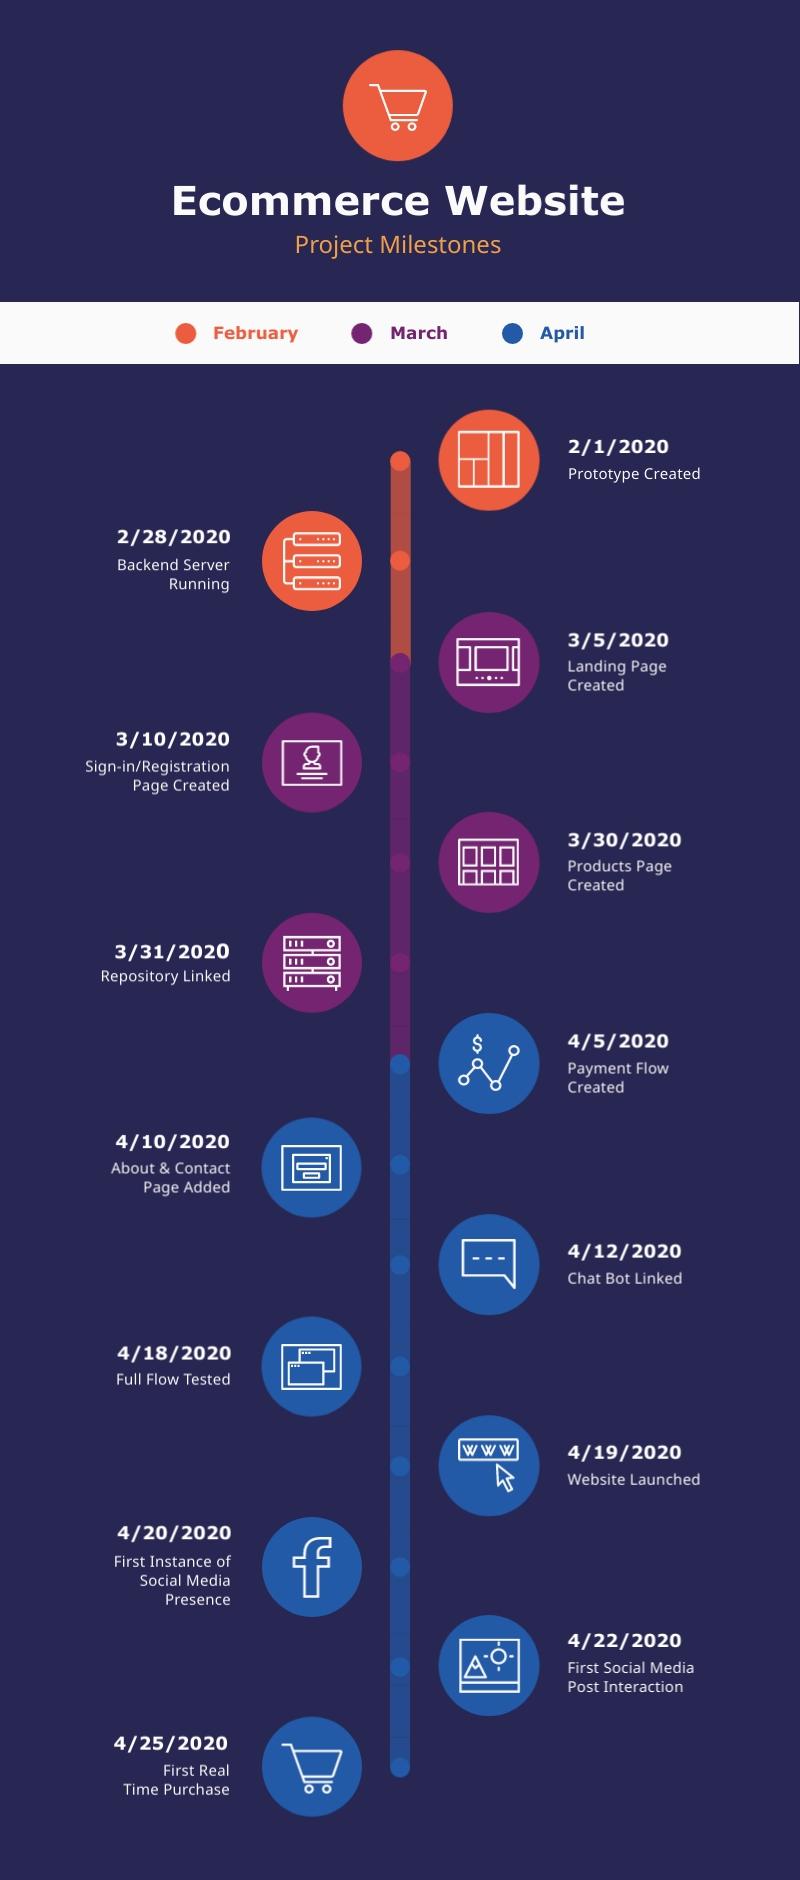 Ecommerce Website Project Milestones - Infographic Template